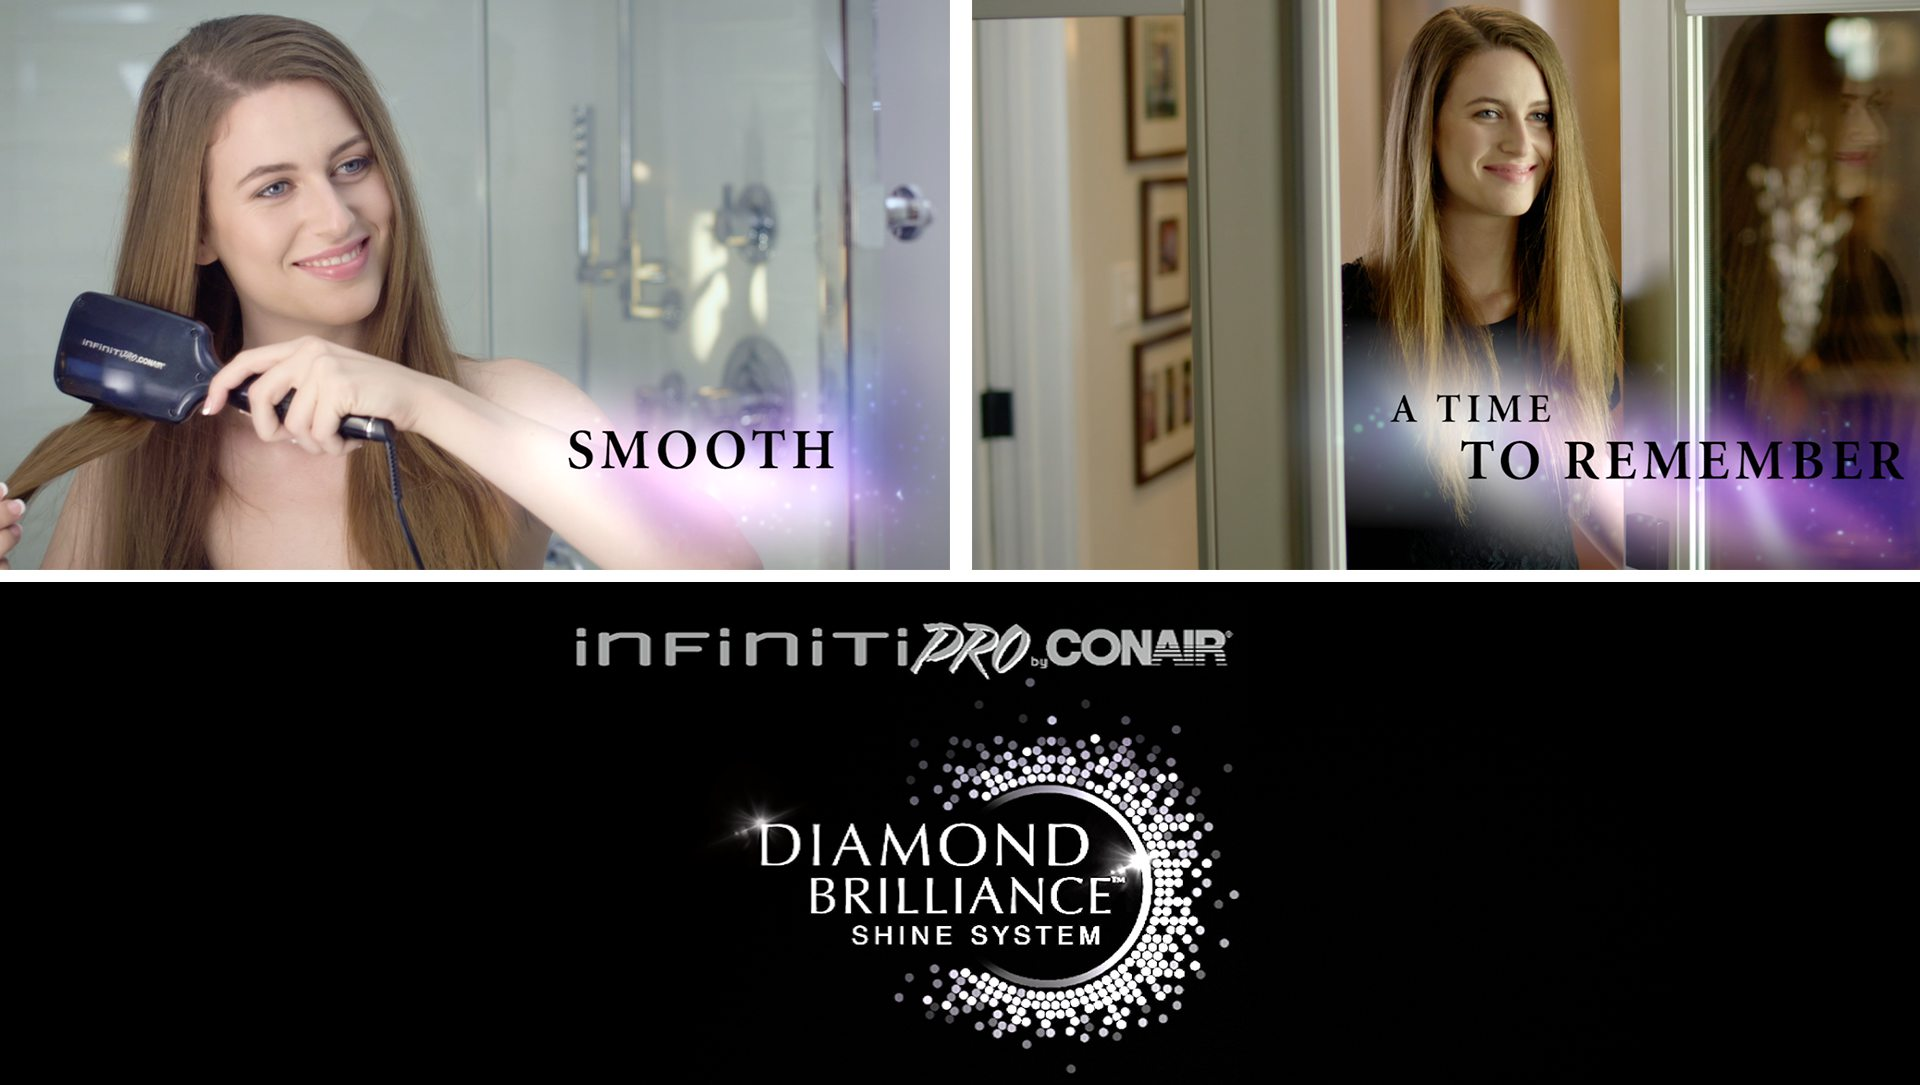 Conair infiniti pro hair commercial